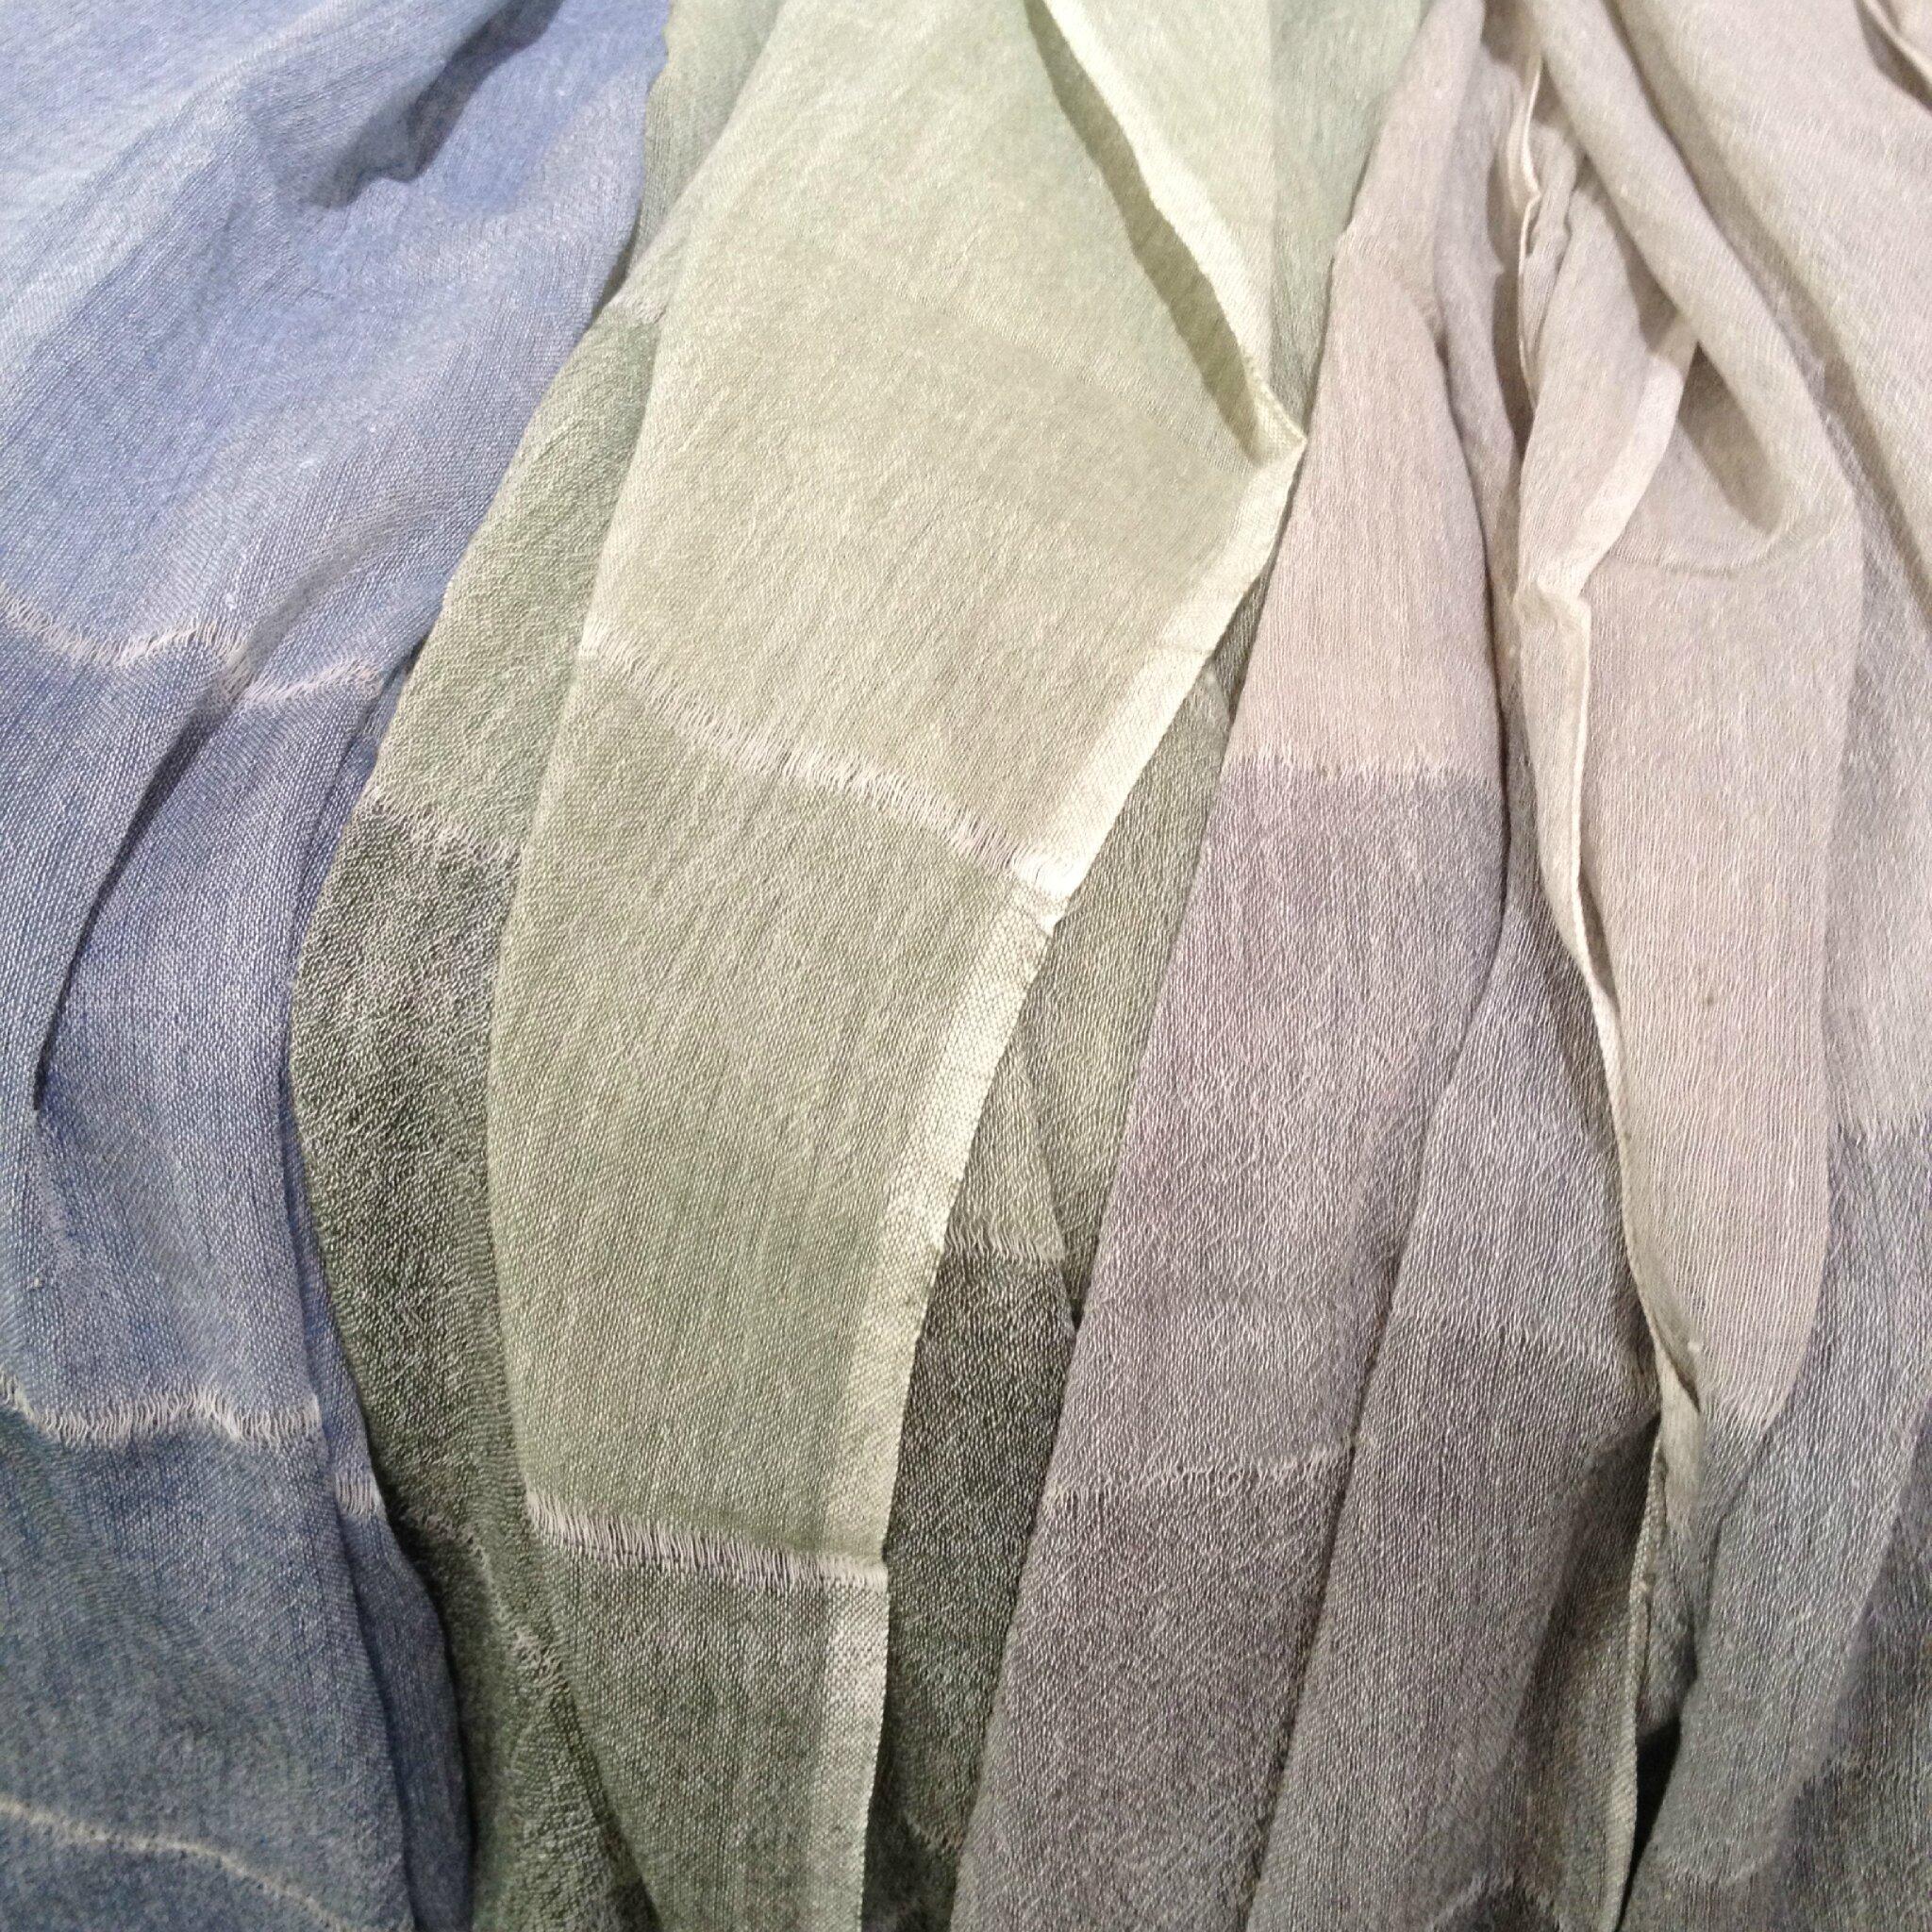 Foulard coton made in Ethiopie Dana ESTELINE Boutique Avant-Après 29 rue Foch 34000 MONTPELLIER